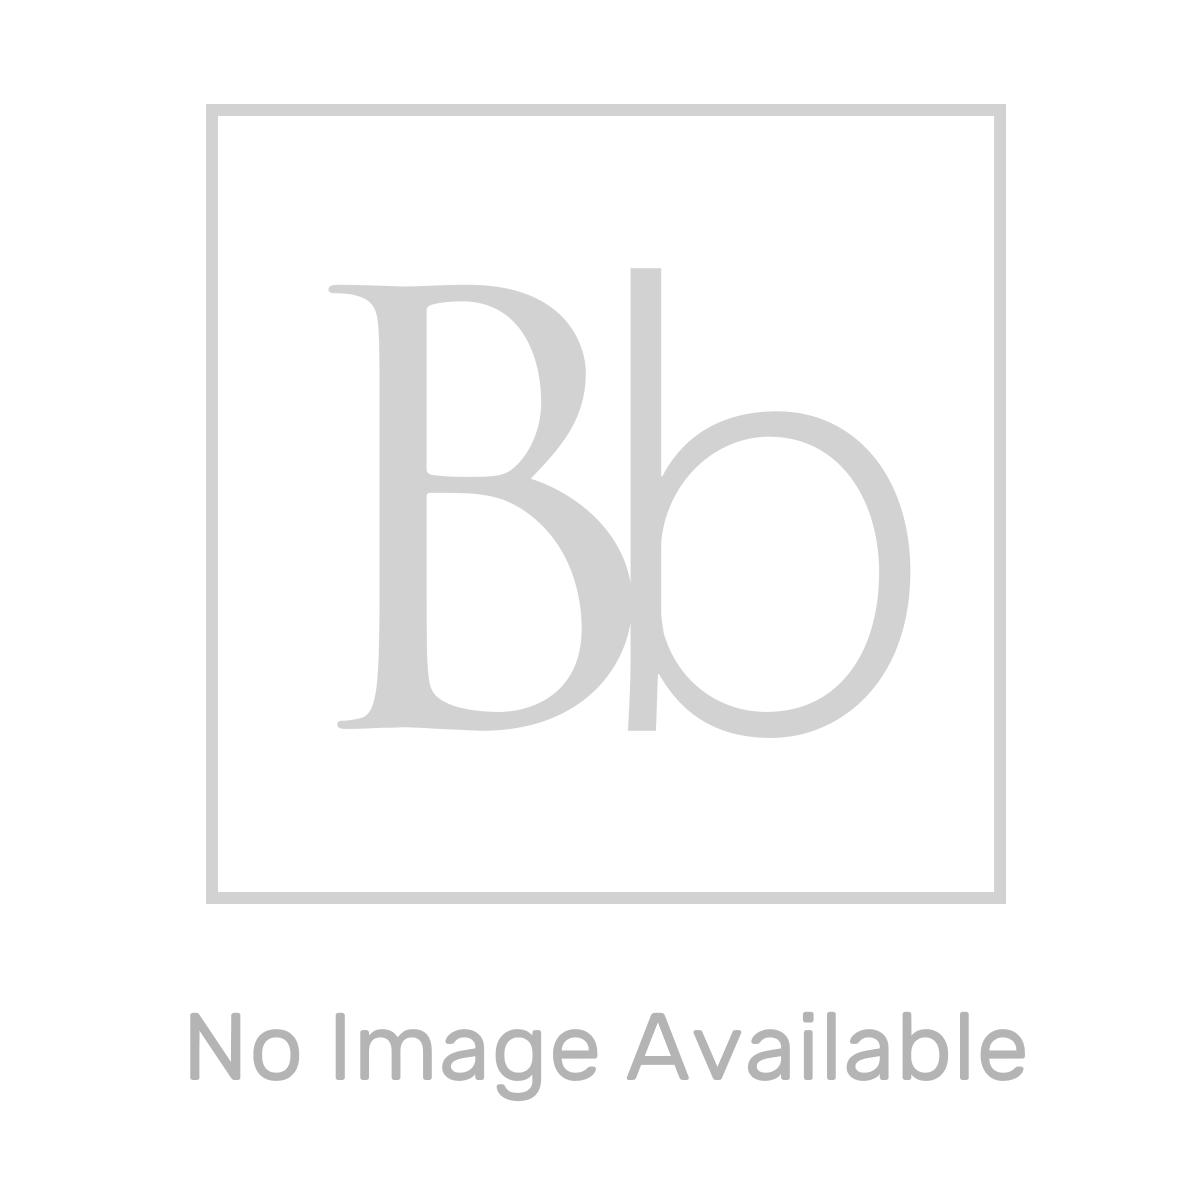 RAK Feeling White Square Single Outlet Thermostatic Shower Valve